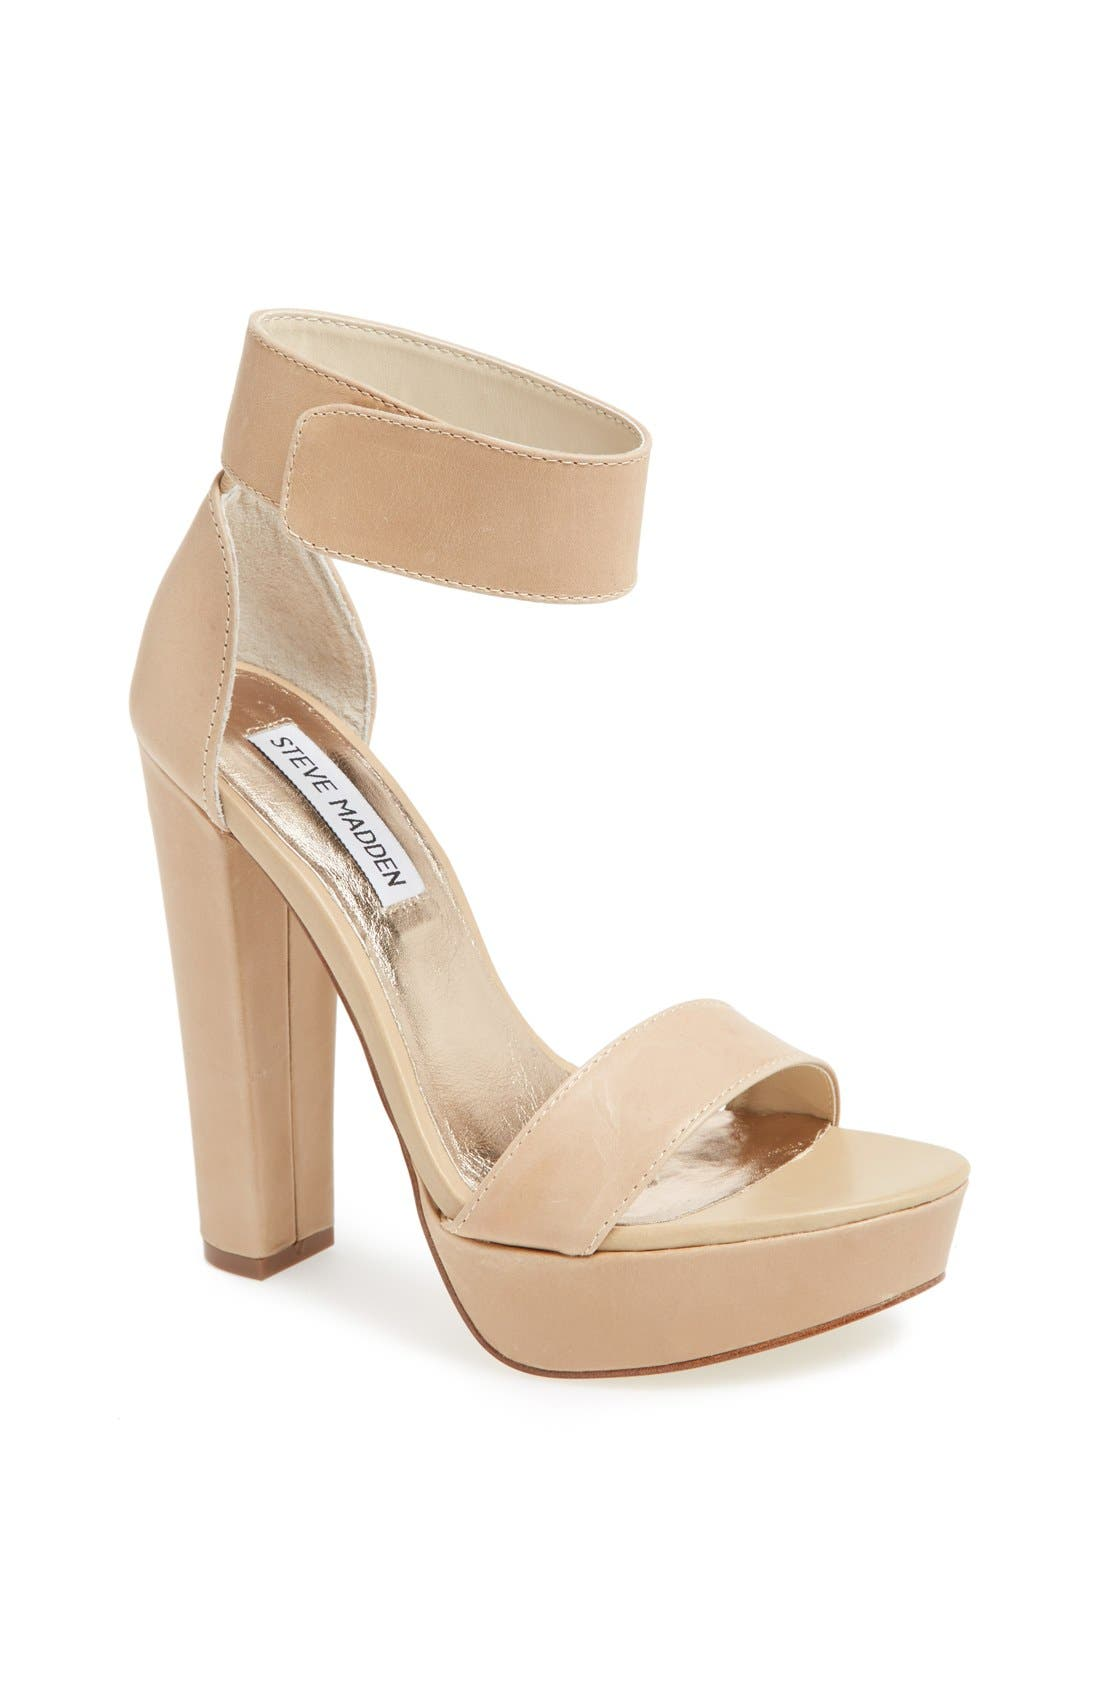 Alternate Image 1 Selected - Steve Madden 'Cluber' Platform Sandal